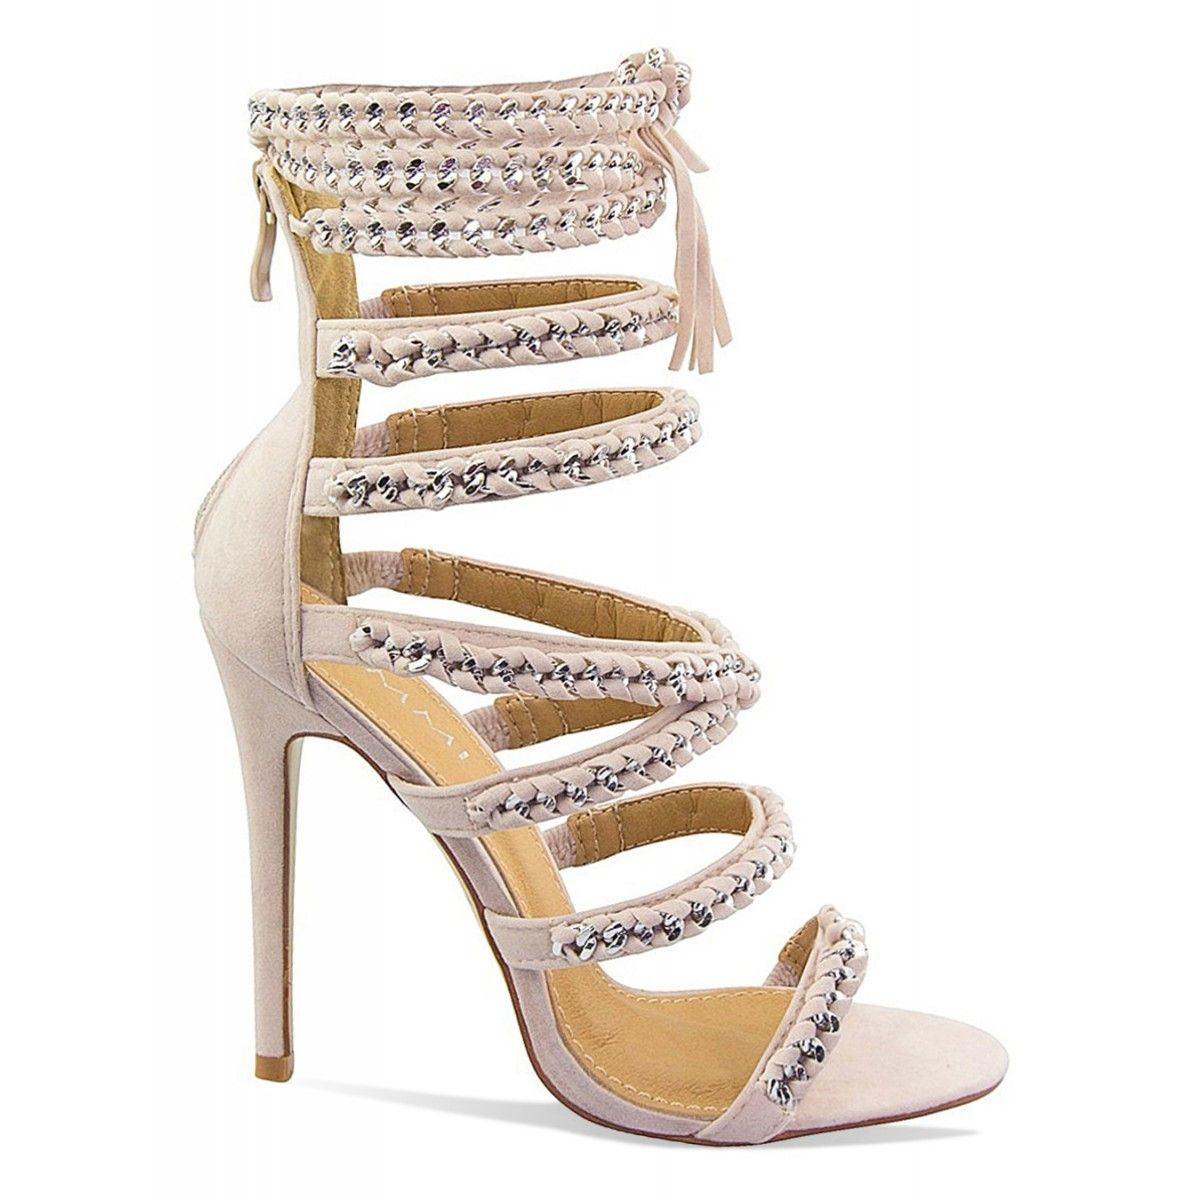 UK Online Women's Footwear Destination : Simmi Shoes